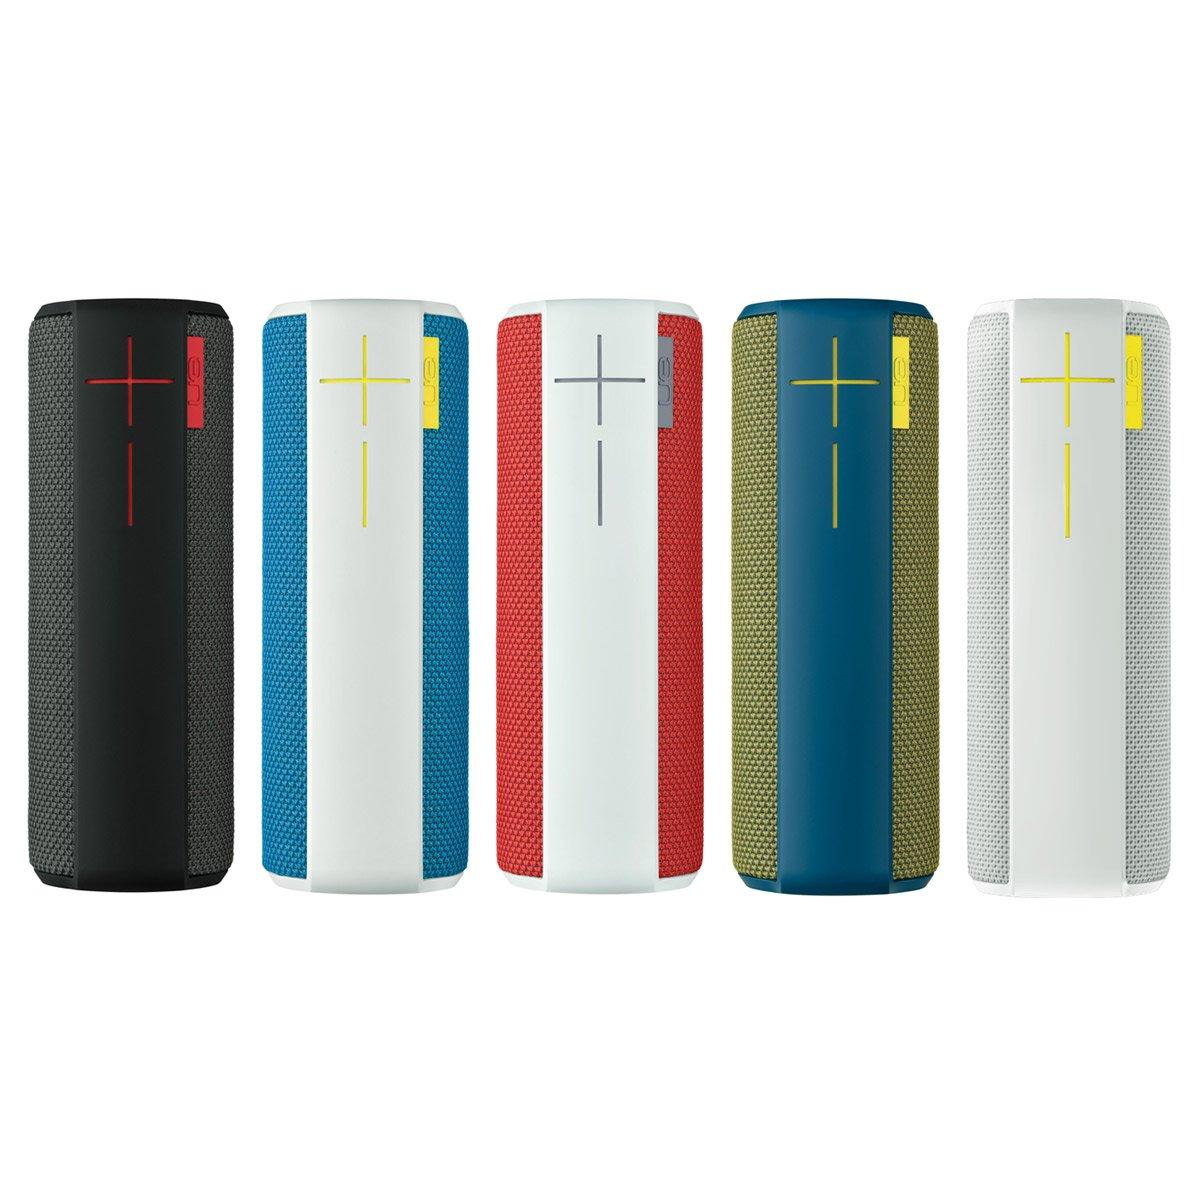 UE Boom - 360 Degree Wireless Bluetooth Speaker